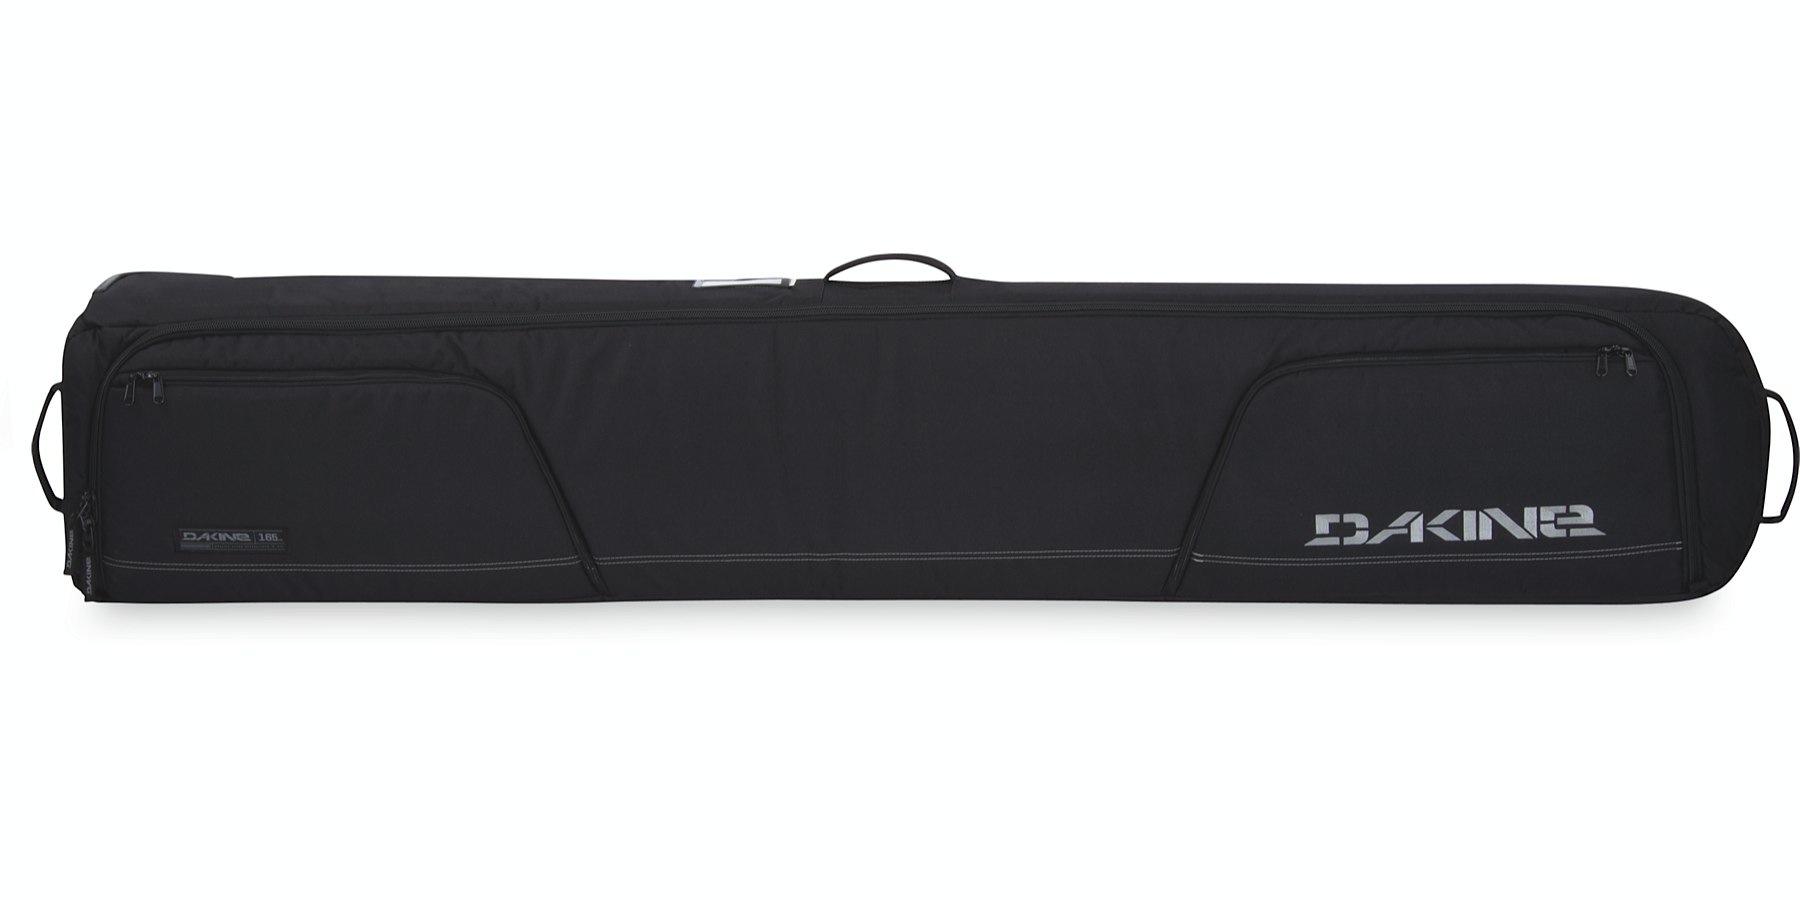 Купить Чехол для сноуборда DAKINE 2015-16 W16 DK LOW ROLLER 157CM BLACK Чехлы 1219156